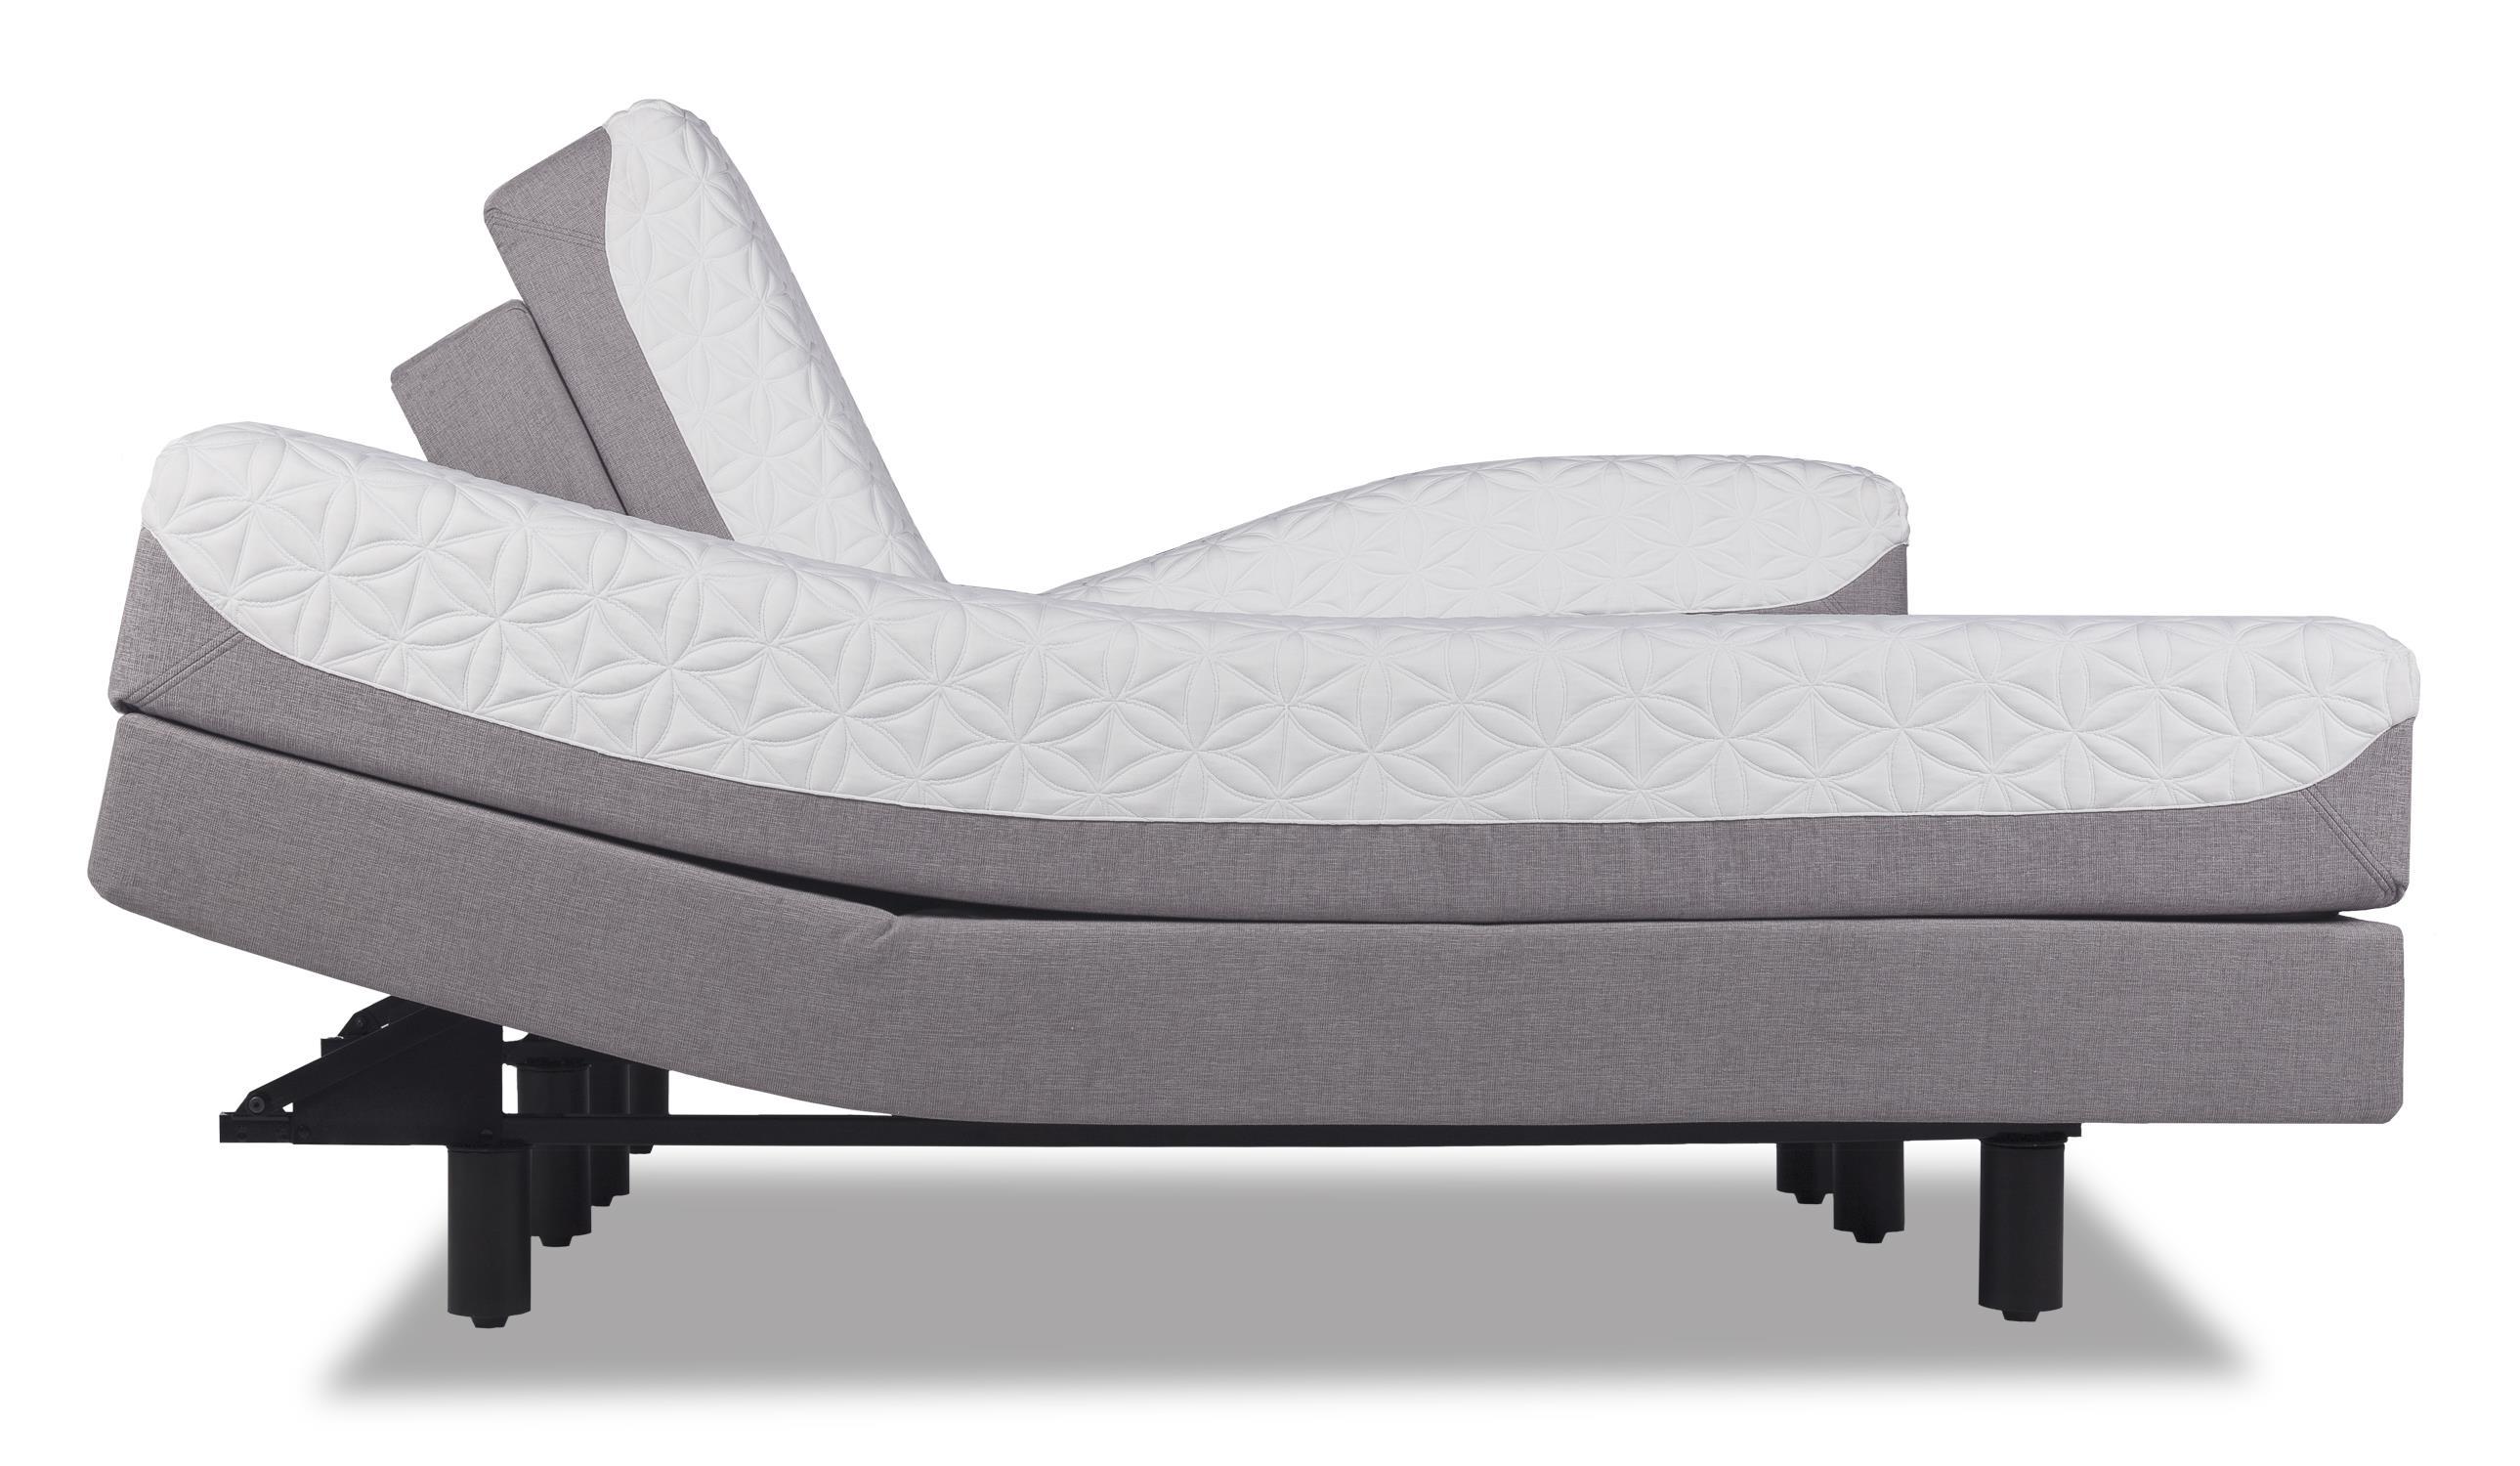 Tempur-Pedic® TEMPUR-Cloud Prima Cal King Medium-Soft Mattress Set - Item Number: 10237180+2x25565290